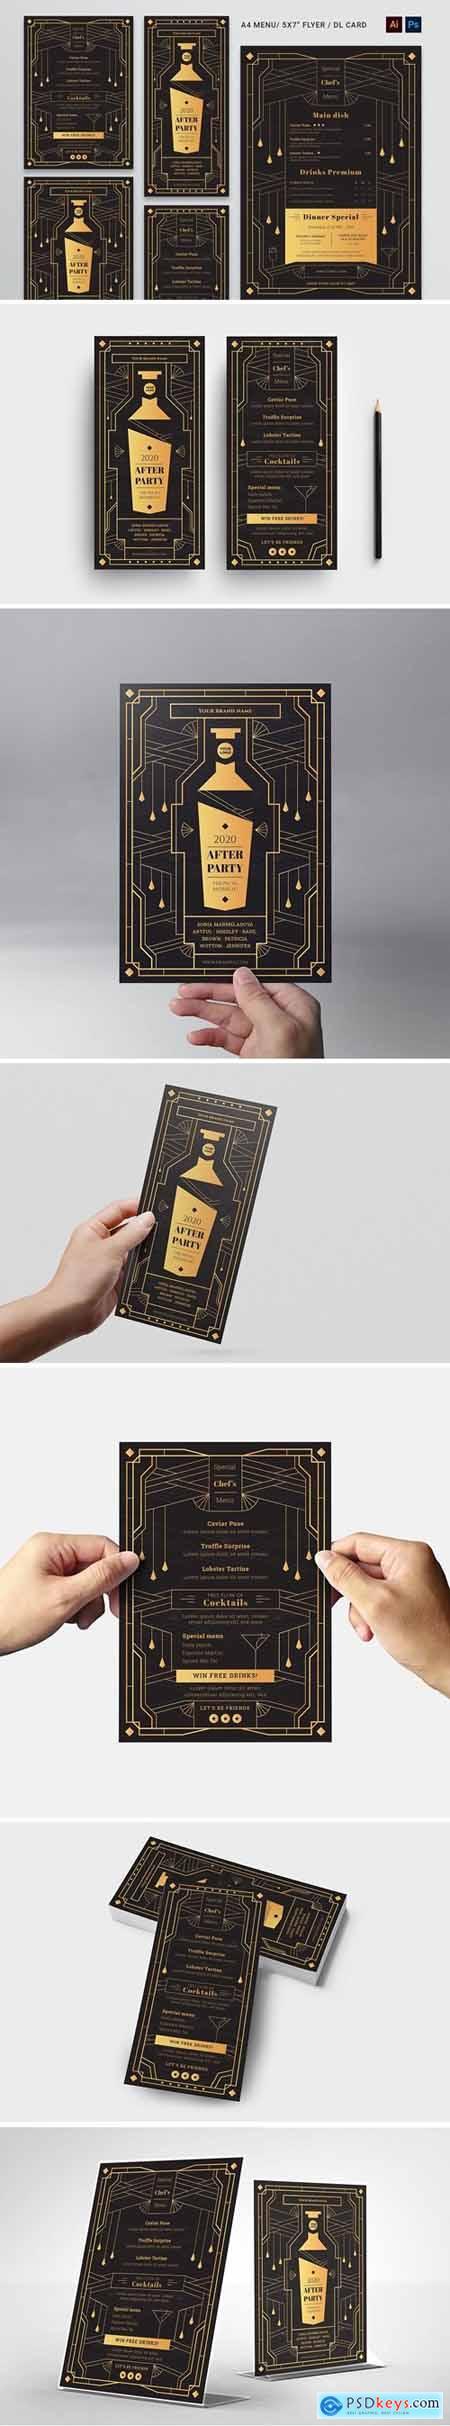 Art Deco Cocktail Bar Flyer & Menu